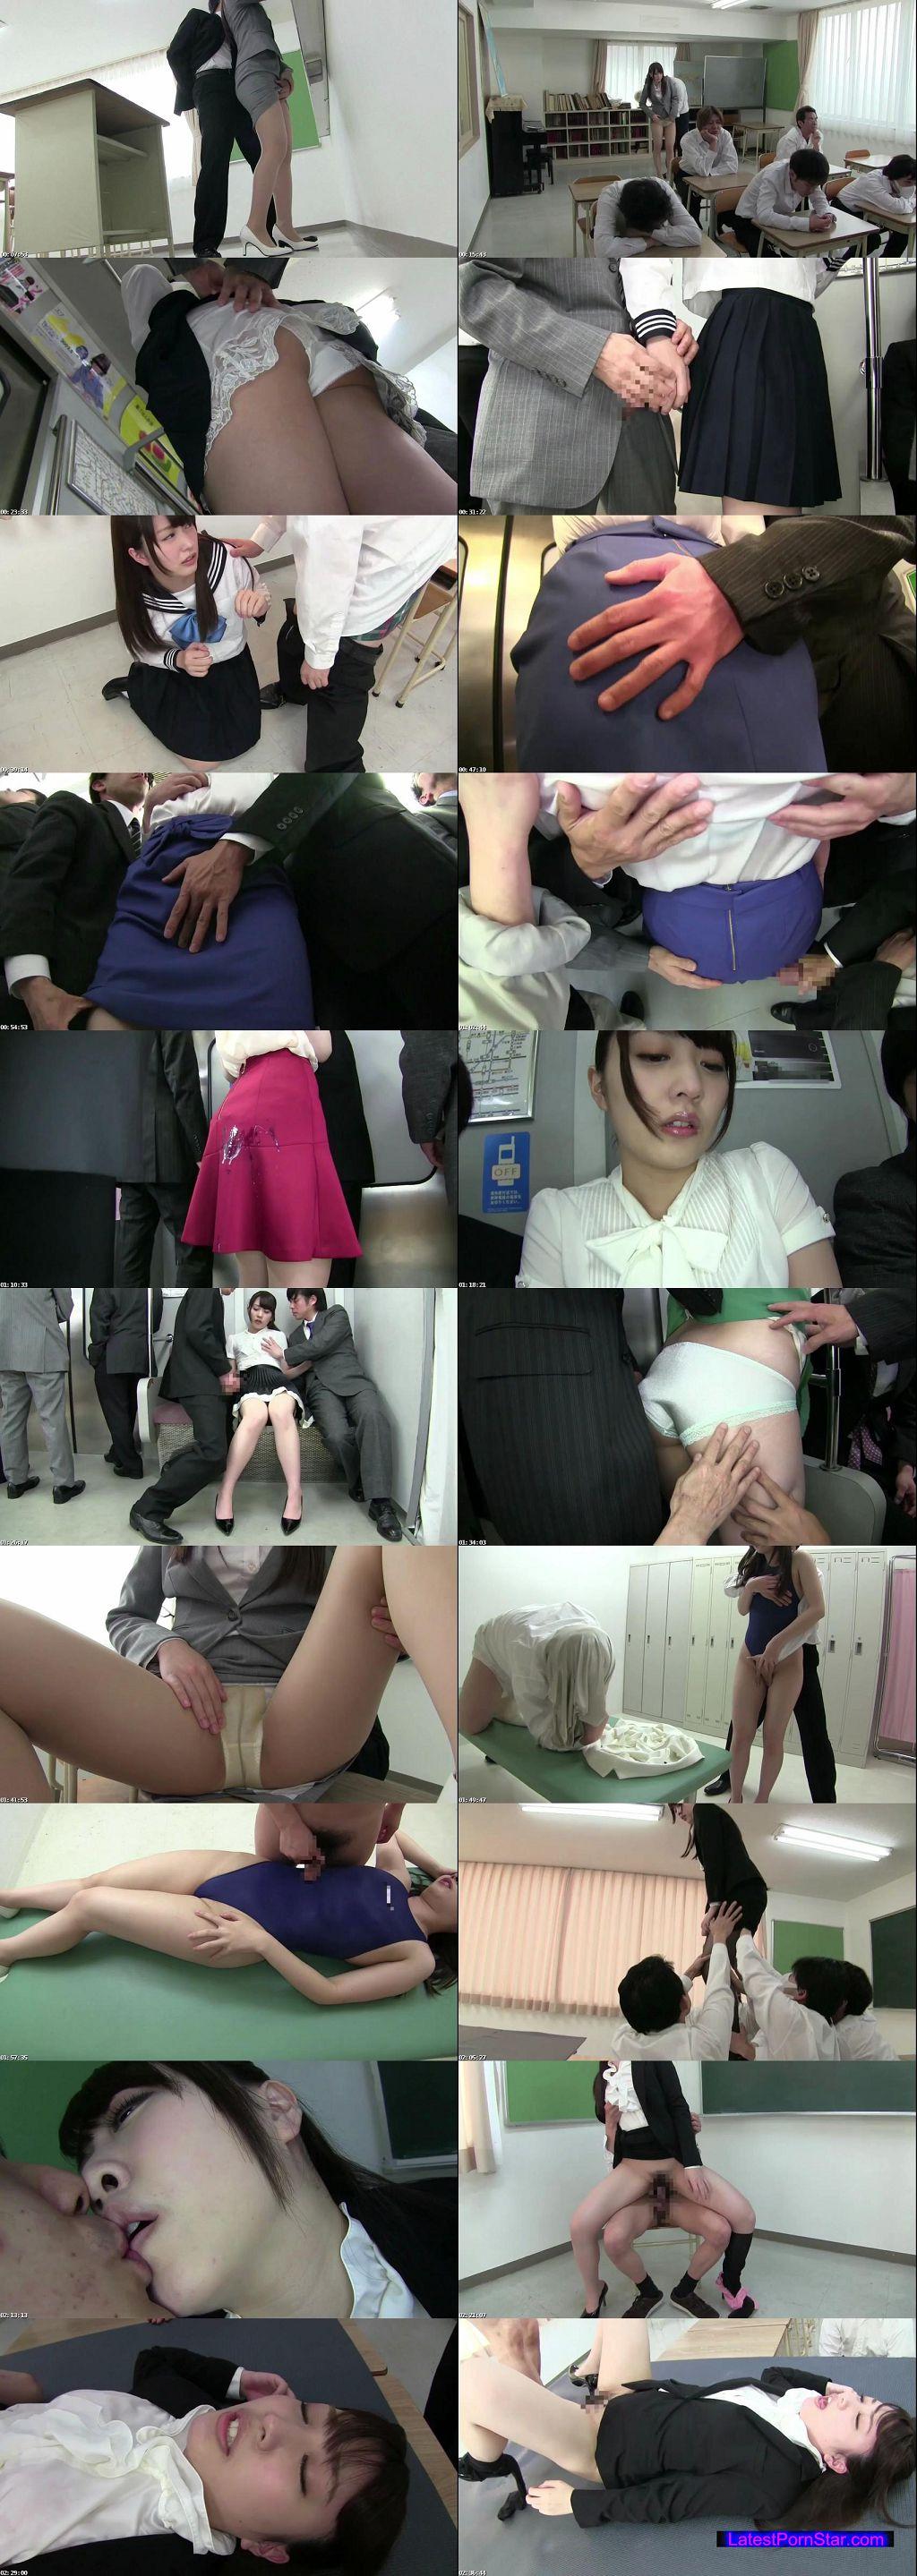 [FNK-022] 私を囲んで下さい、そしてスカートを汚して下さい 教育実習生・優希音の妄想着衣痴漢